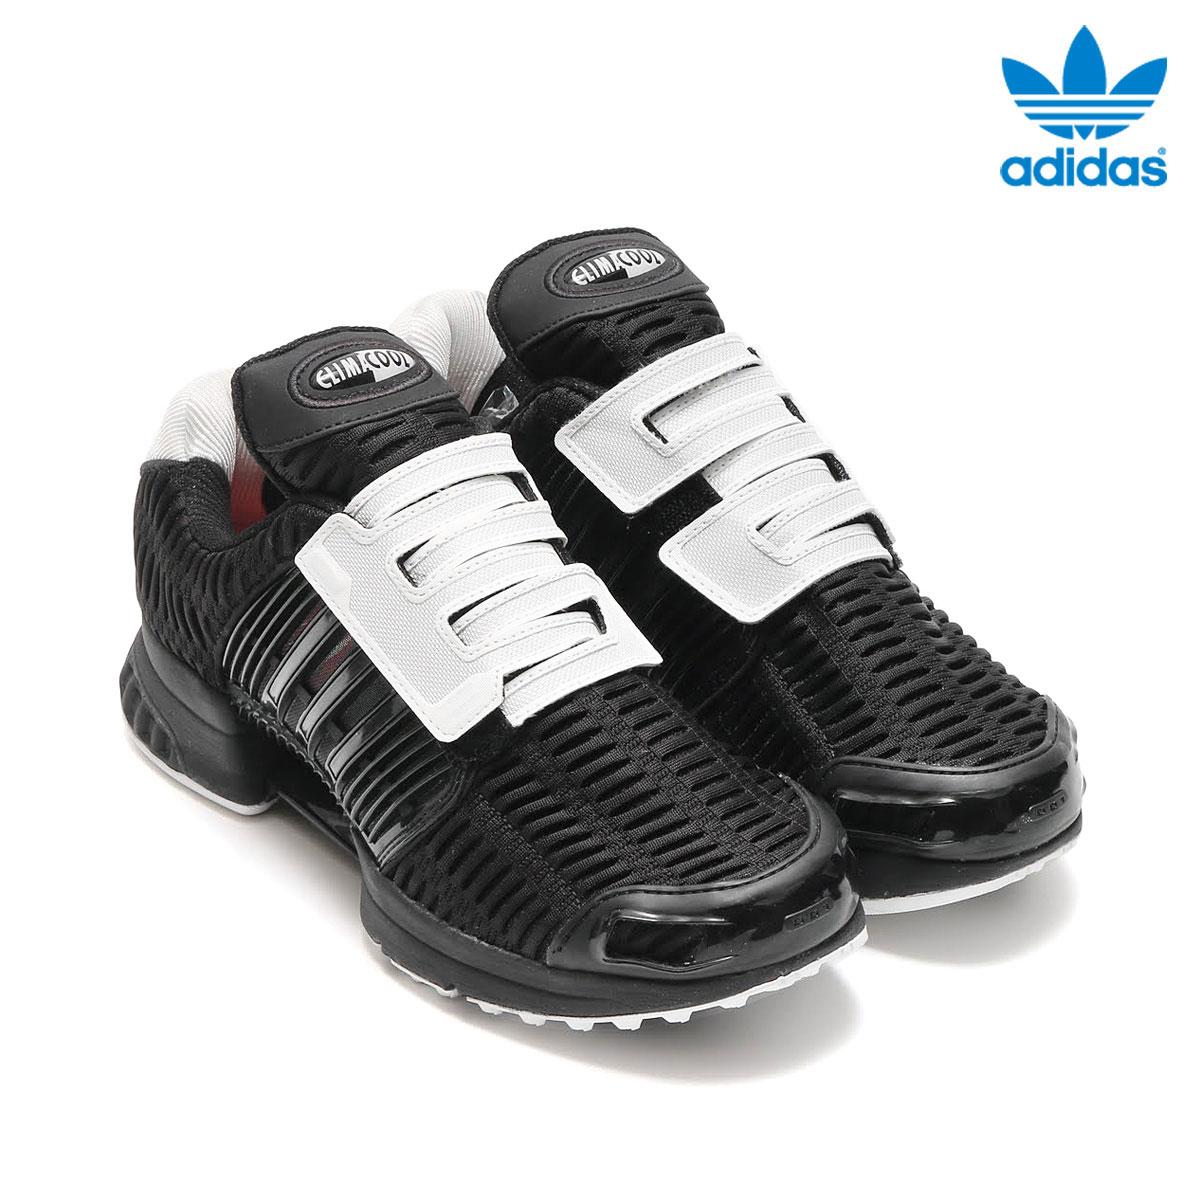 e083fb156891 atmos pink  adidas Originals CLIMACOOL 1 CMF (アディダスクライマクール 1 CMF) (Core  Black Core Black Vintage White) 17SU-S